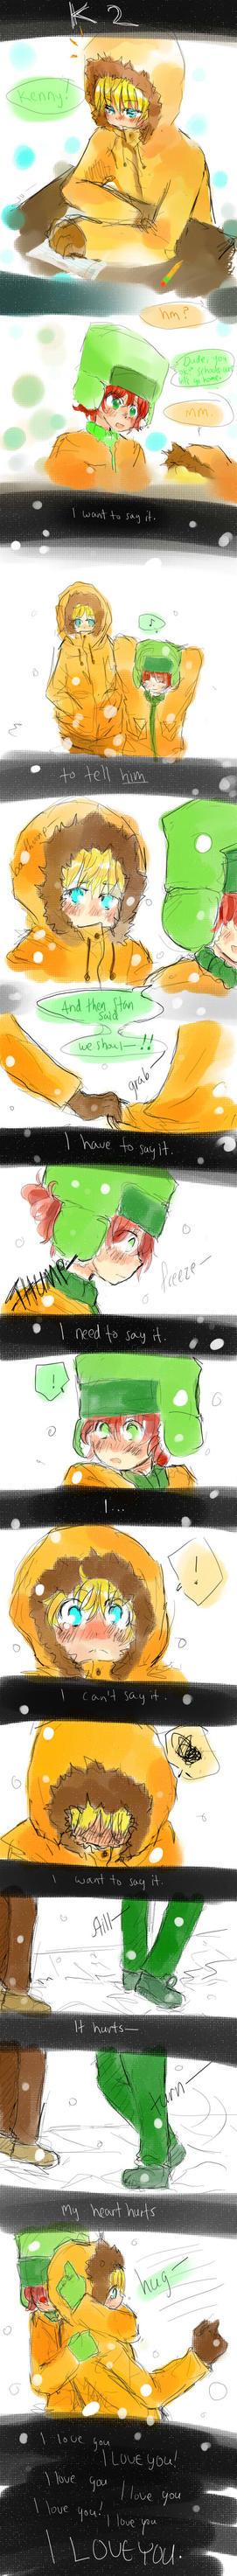 South Park - K2 comic by Burbs-chan